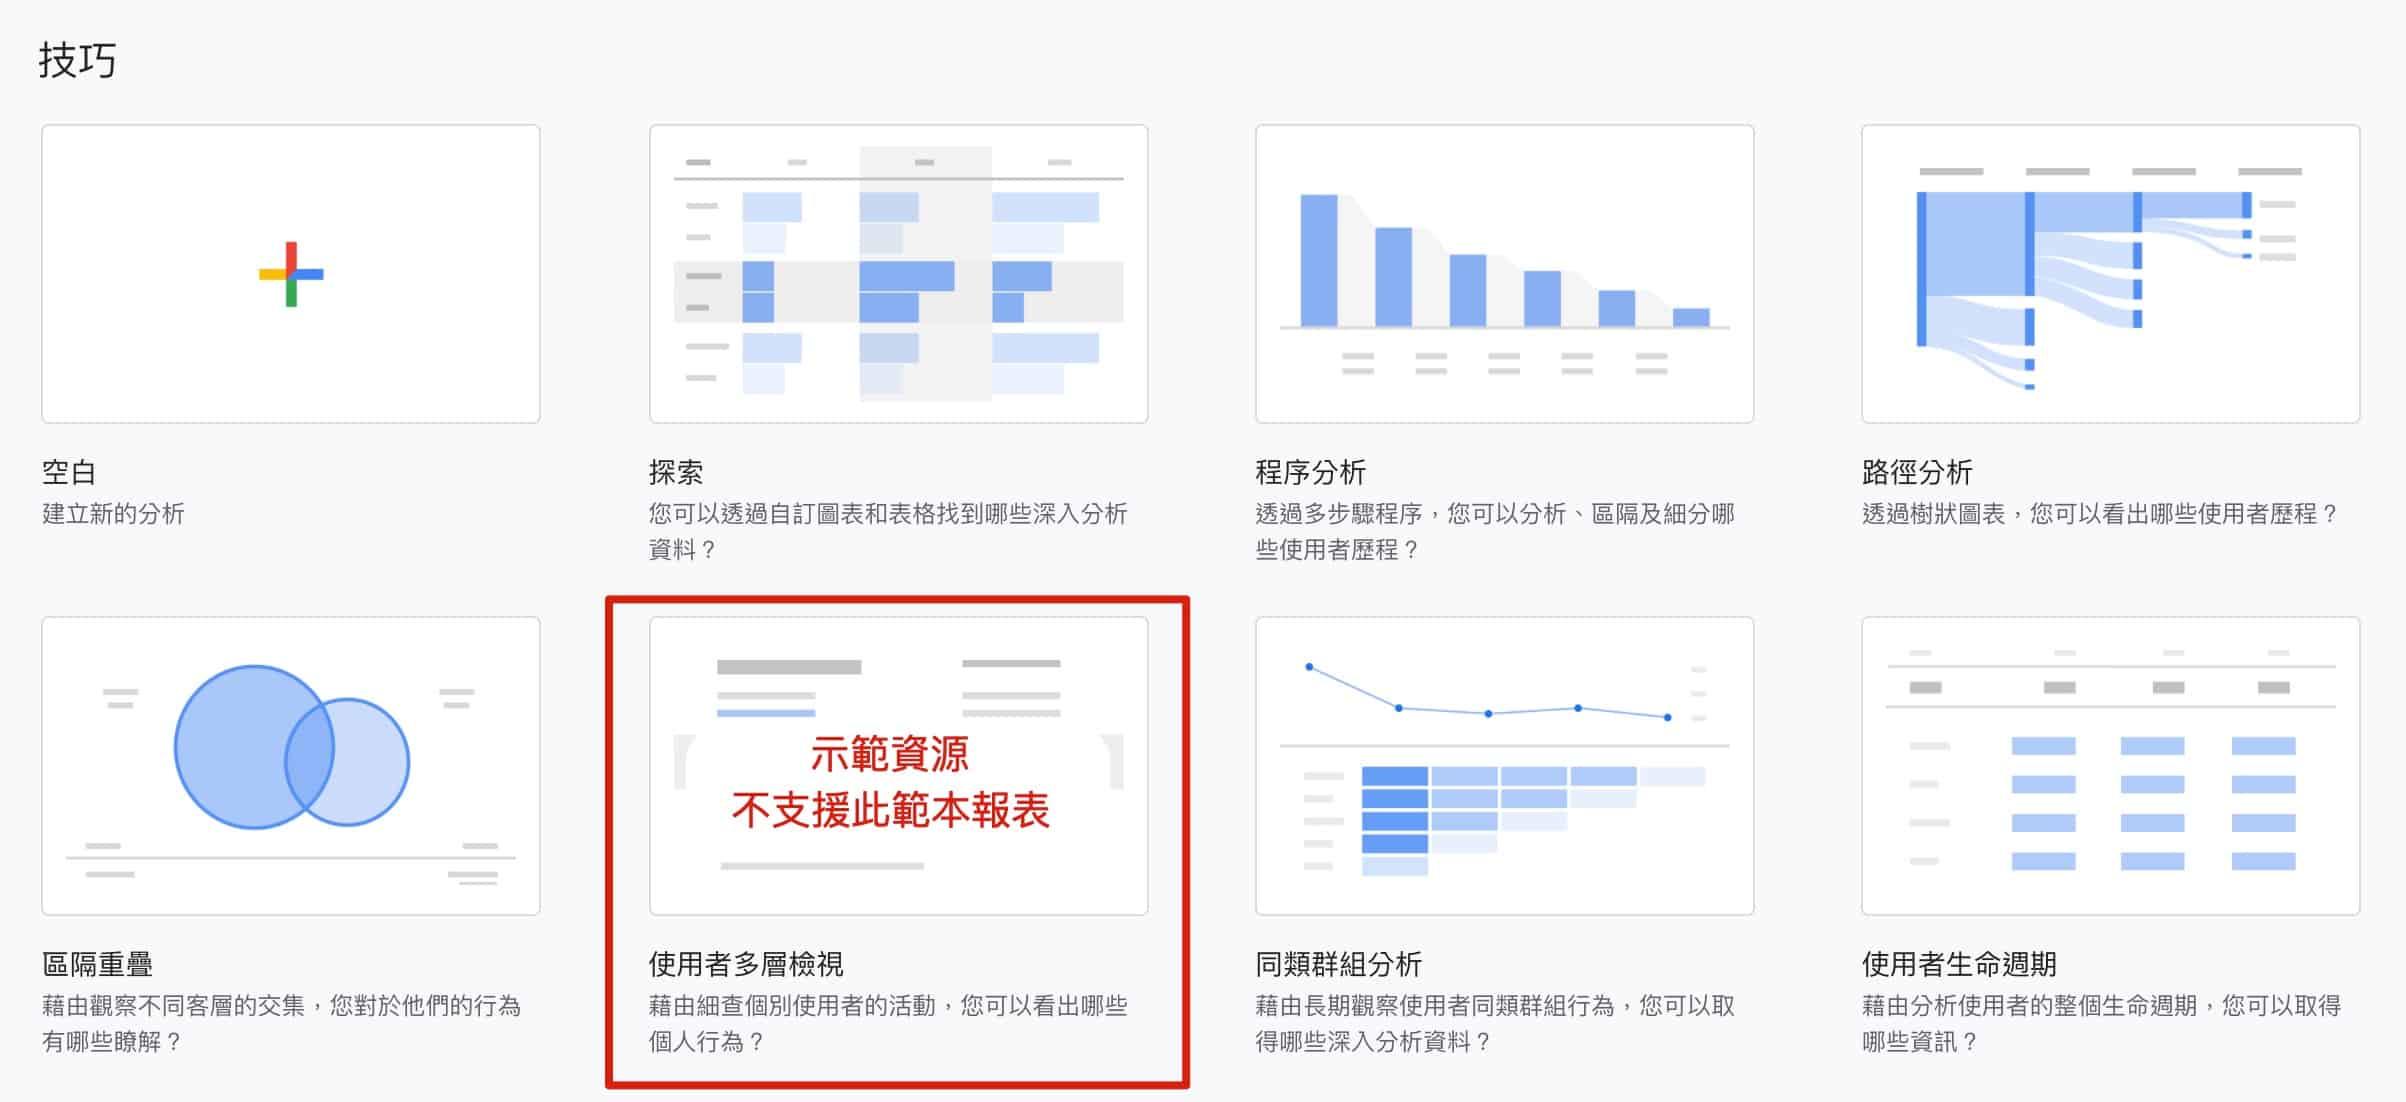 Google Analytics 4 分析中心範本報表